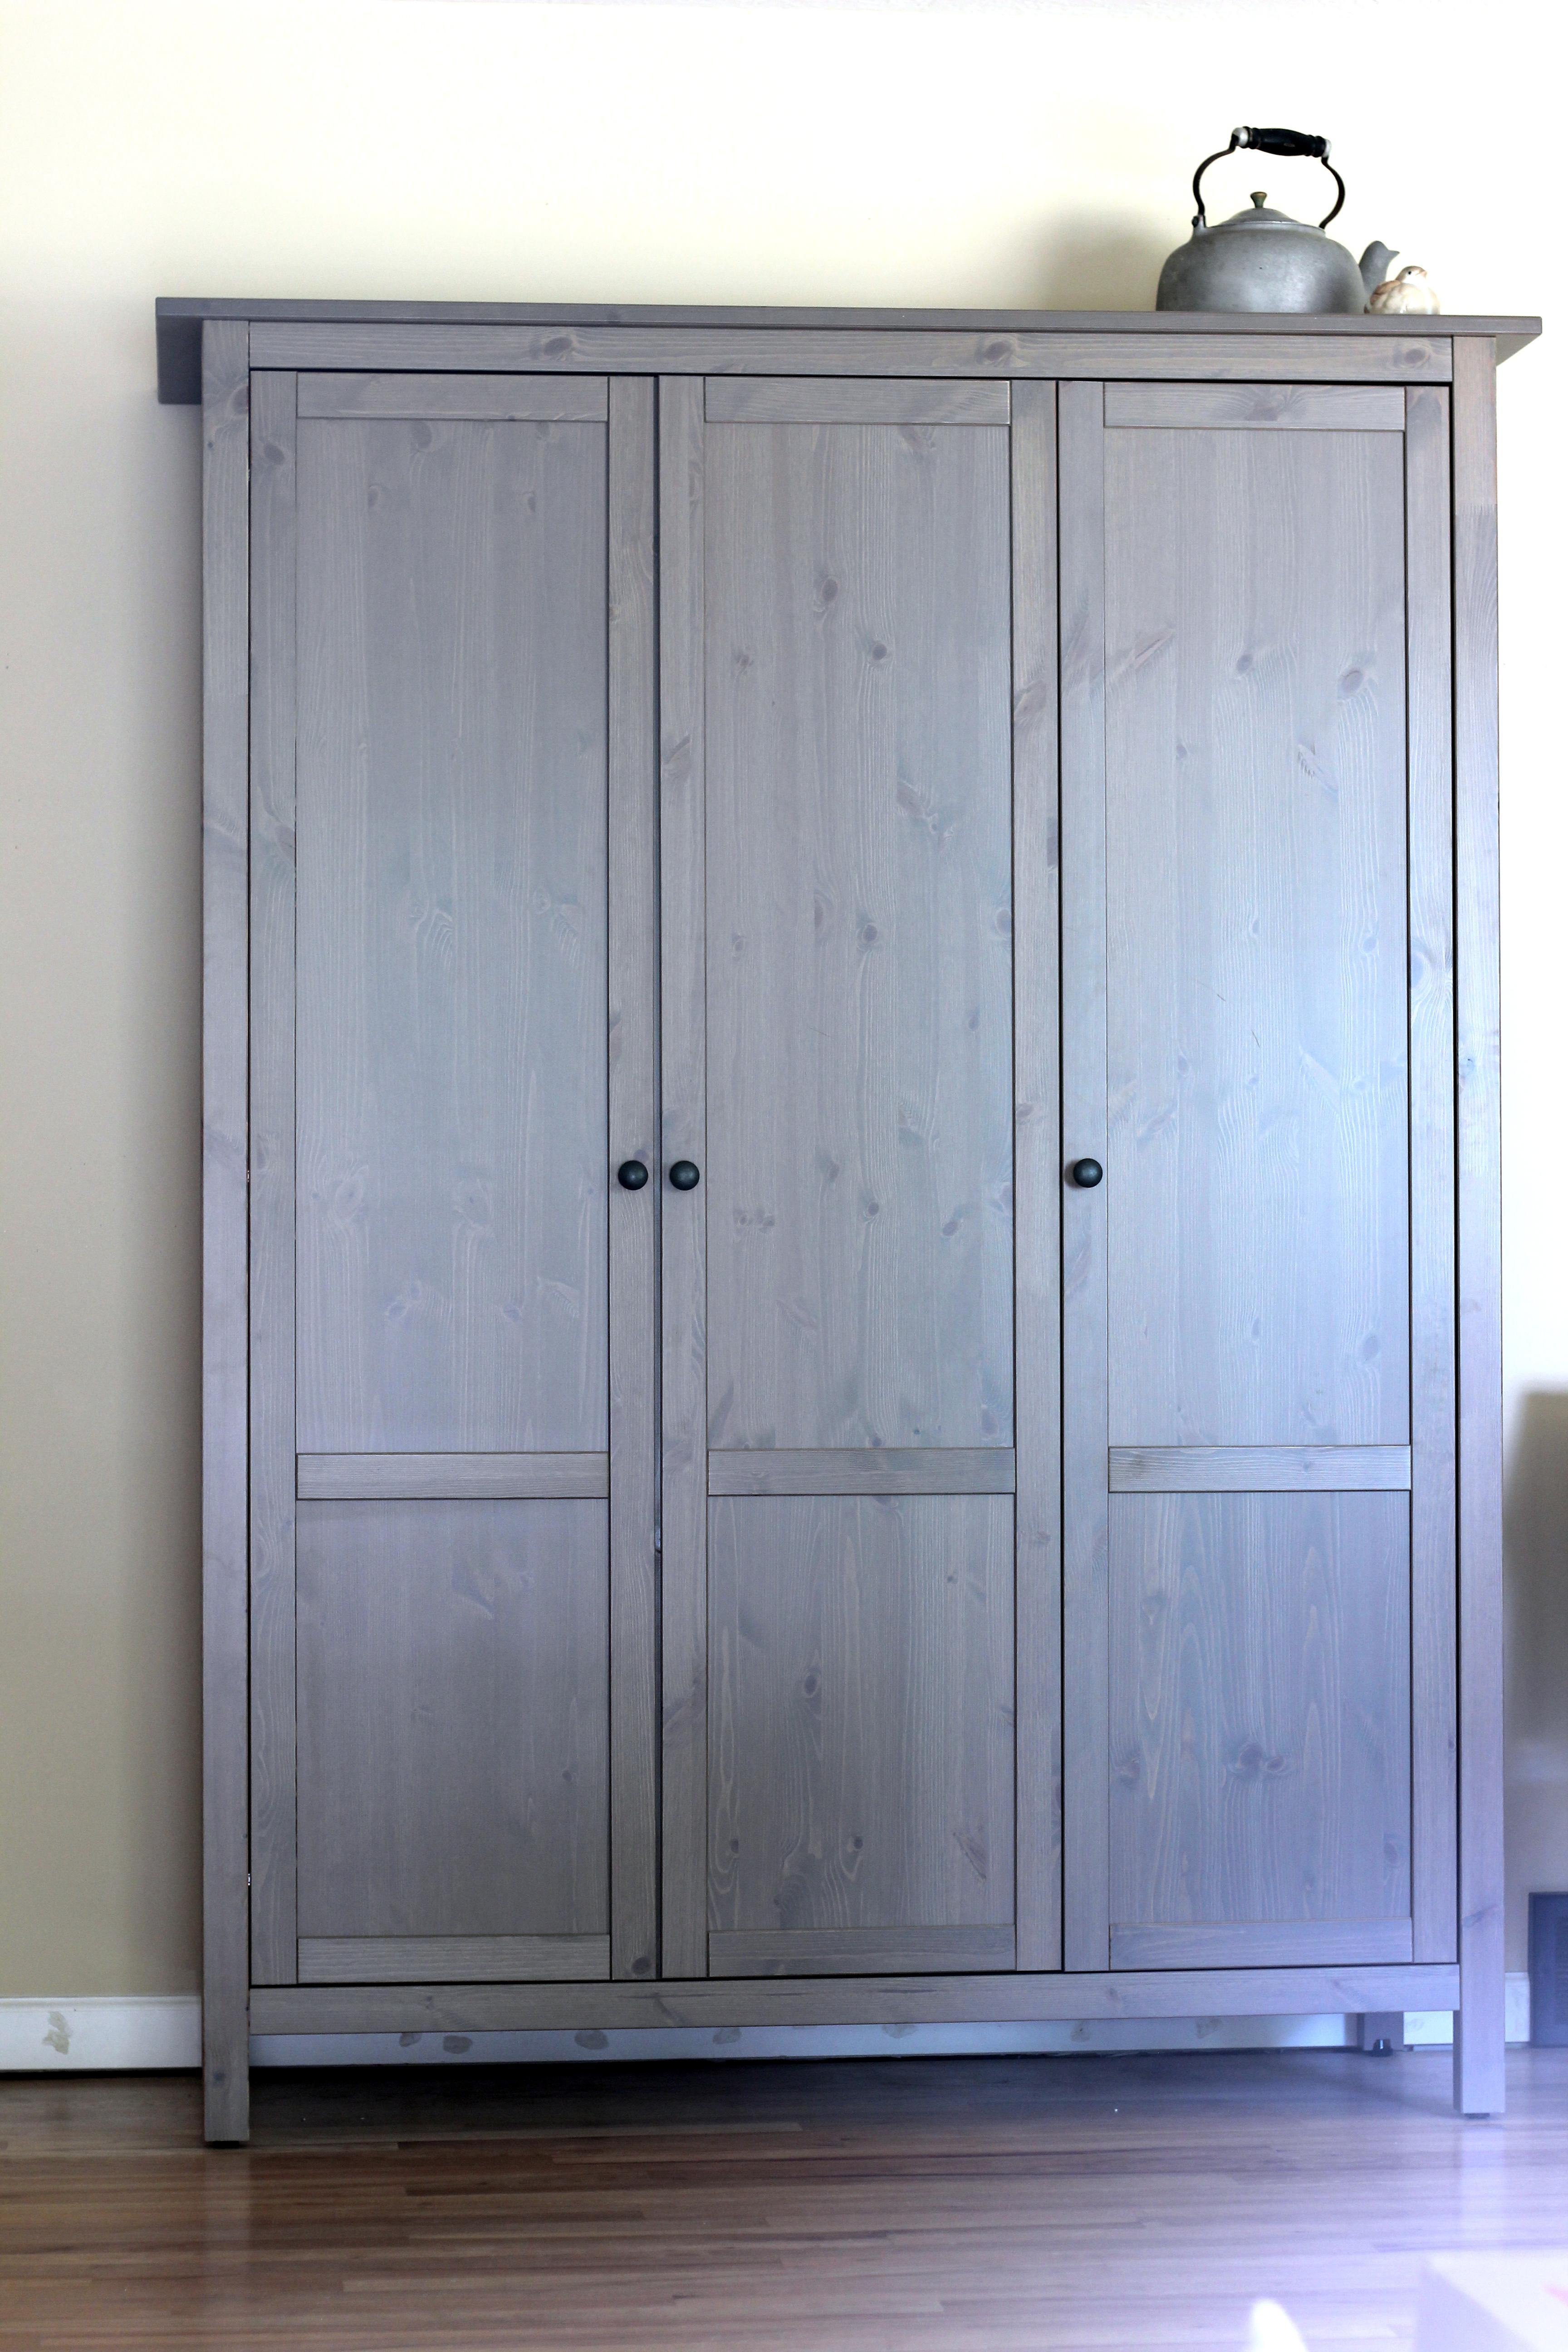 ikea hack wardrobe to sewing room homespun haley. Black Bedroom Furniture Sets. Home Design Ideas